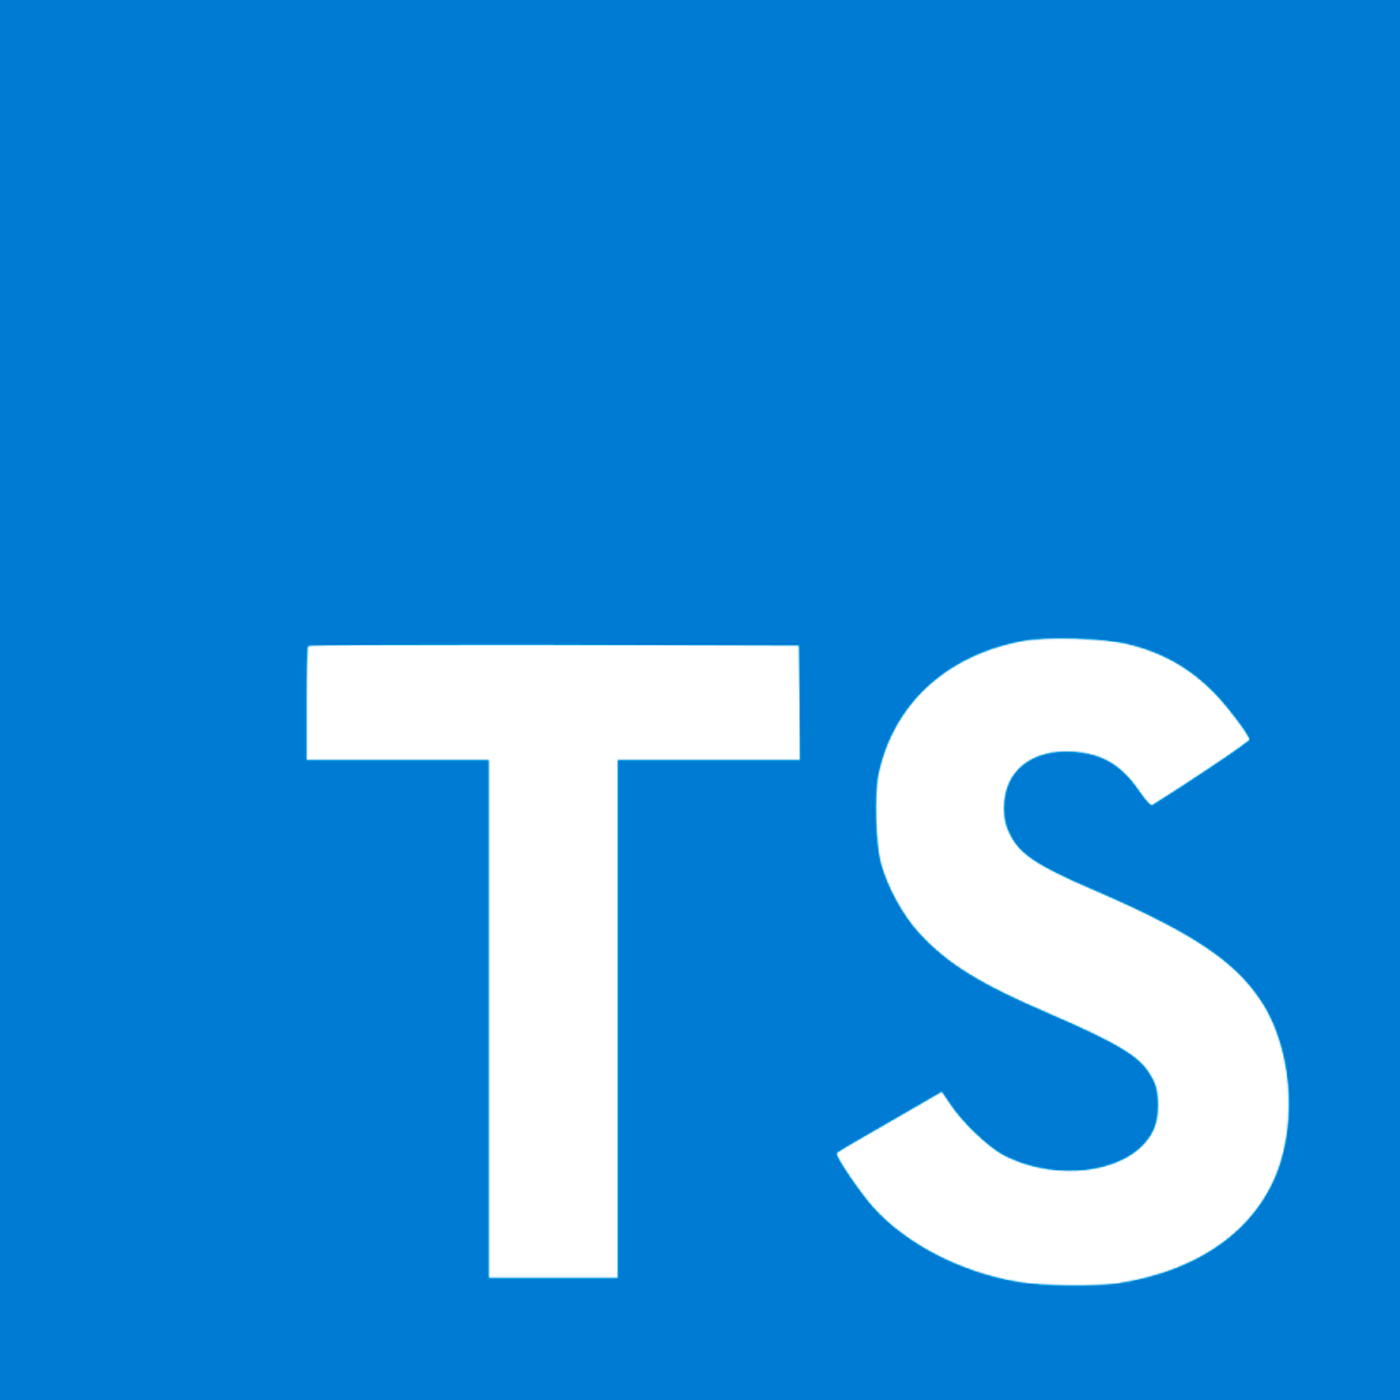 The TypeScript logo